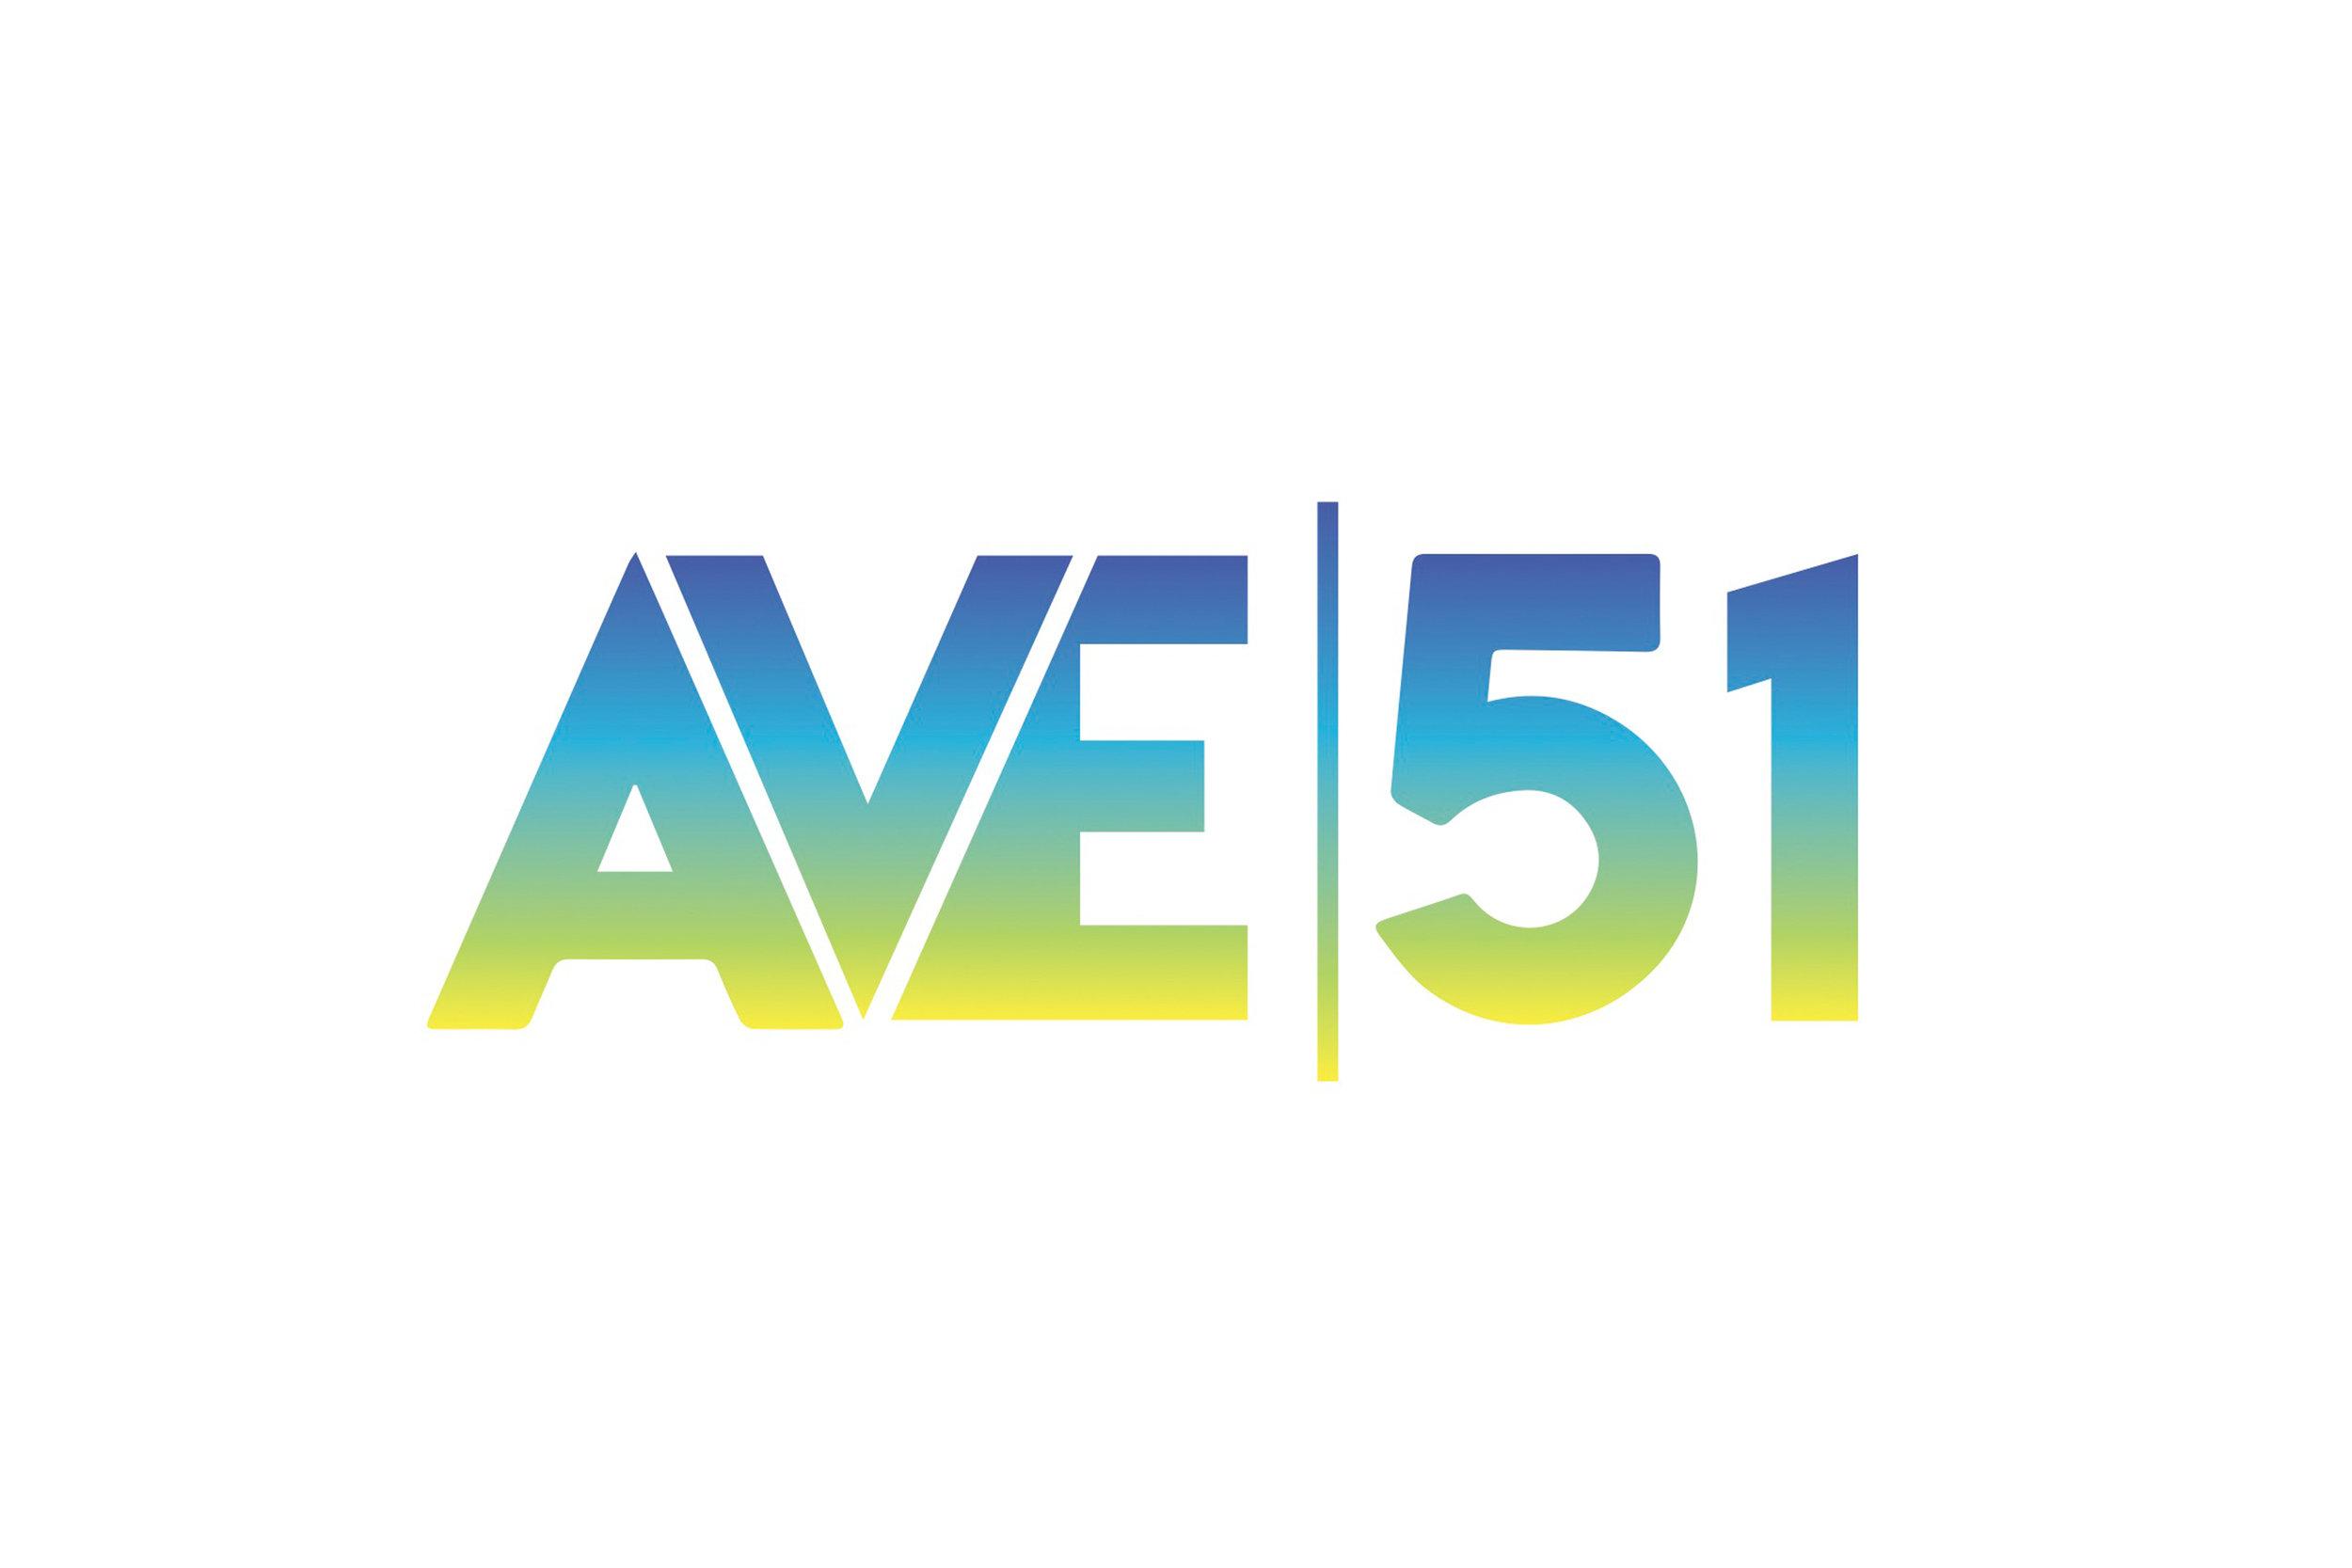 Ave51.jpg